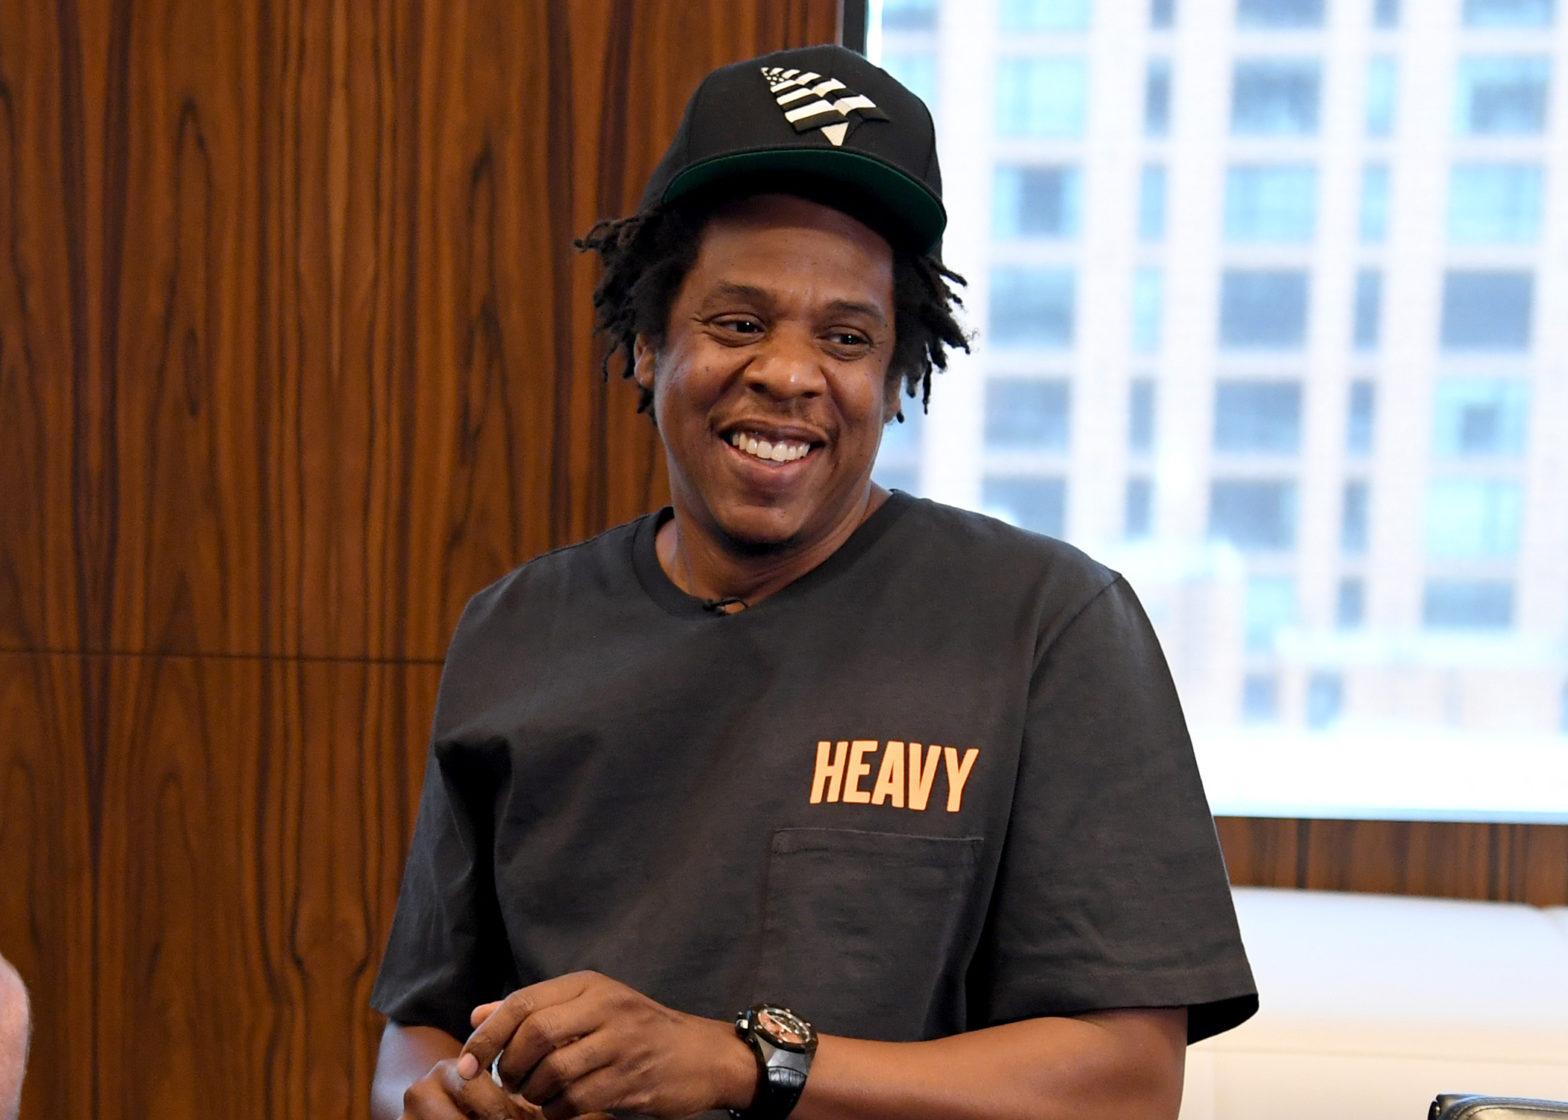 Jay-Z, Roc Nation Invest In Digital Sports Platform Fanatics Now Valued At $18 Billion